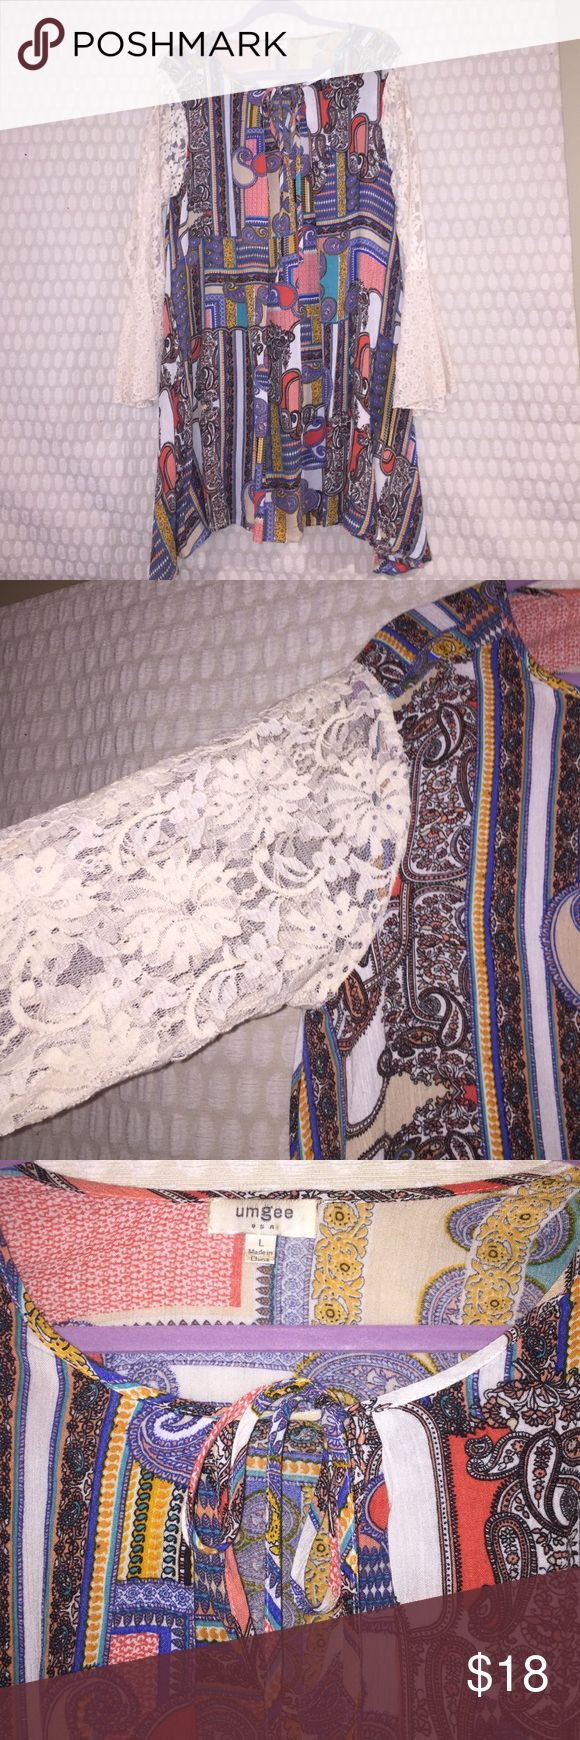 Long sleeve paisley print dress darling floral/paisley print long sleeve dress with crochet sleeve. Worn 1 time. Umgee Dresses Long Sleeve